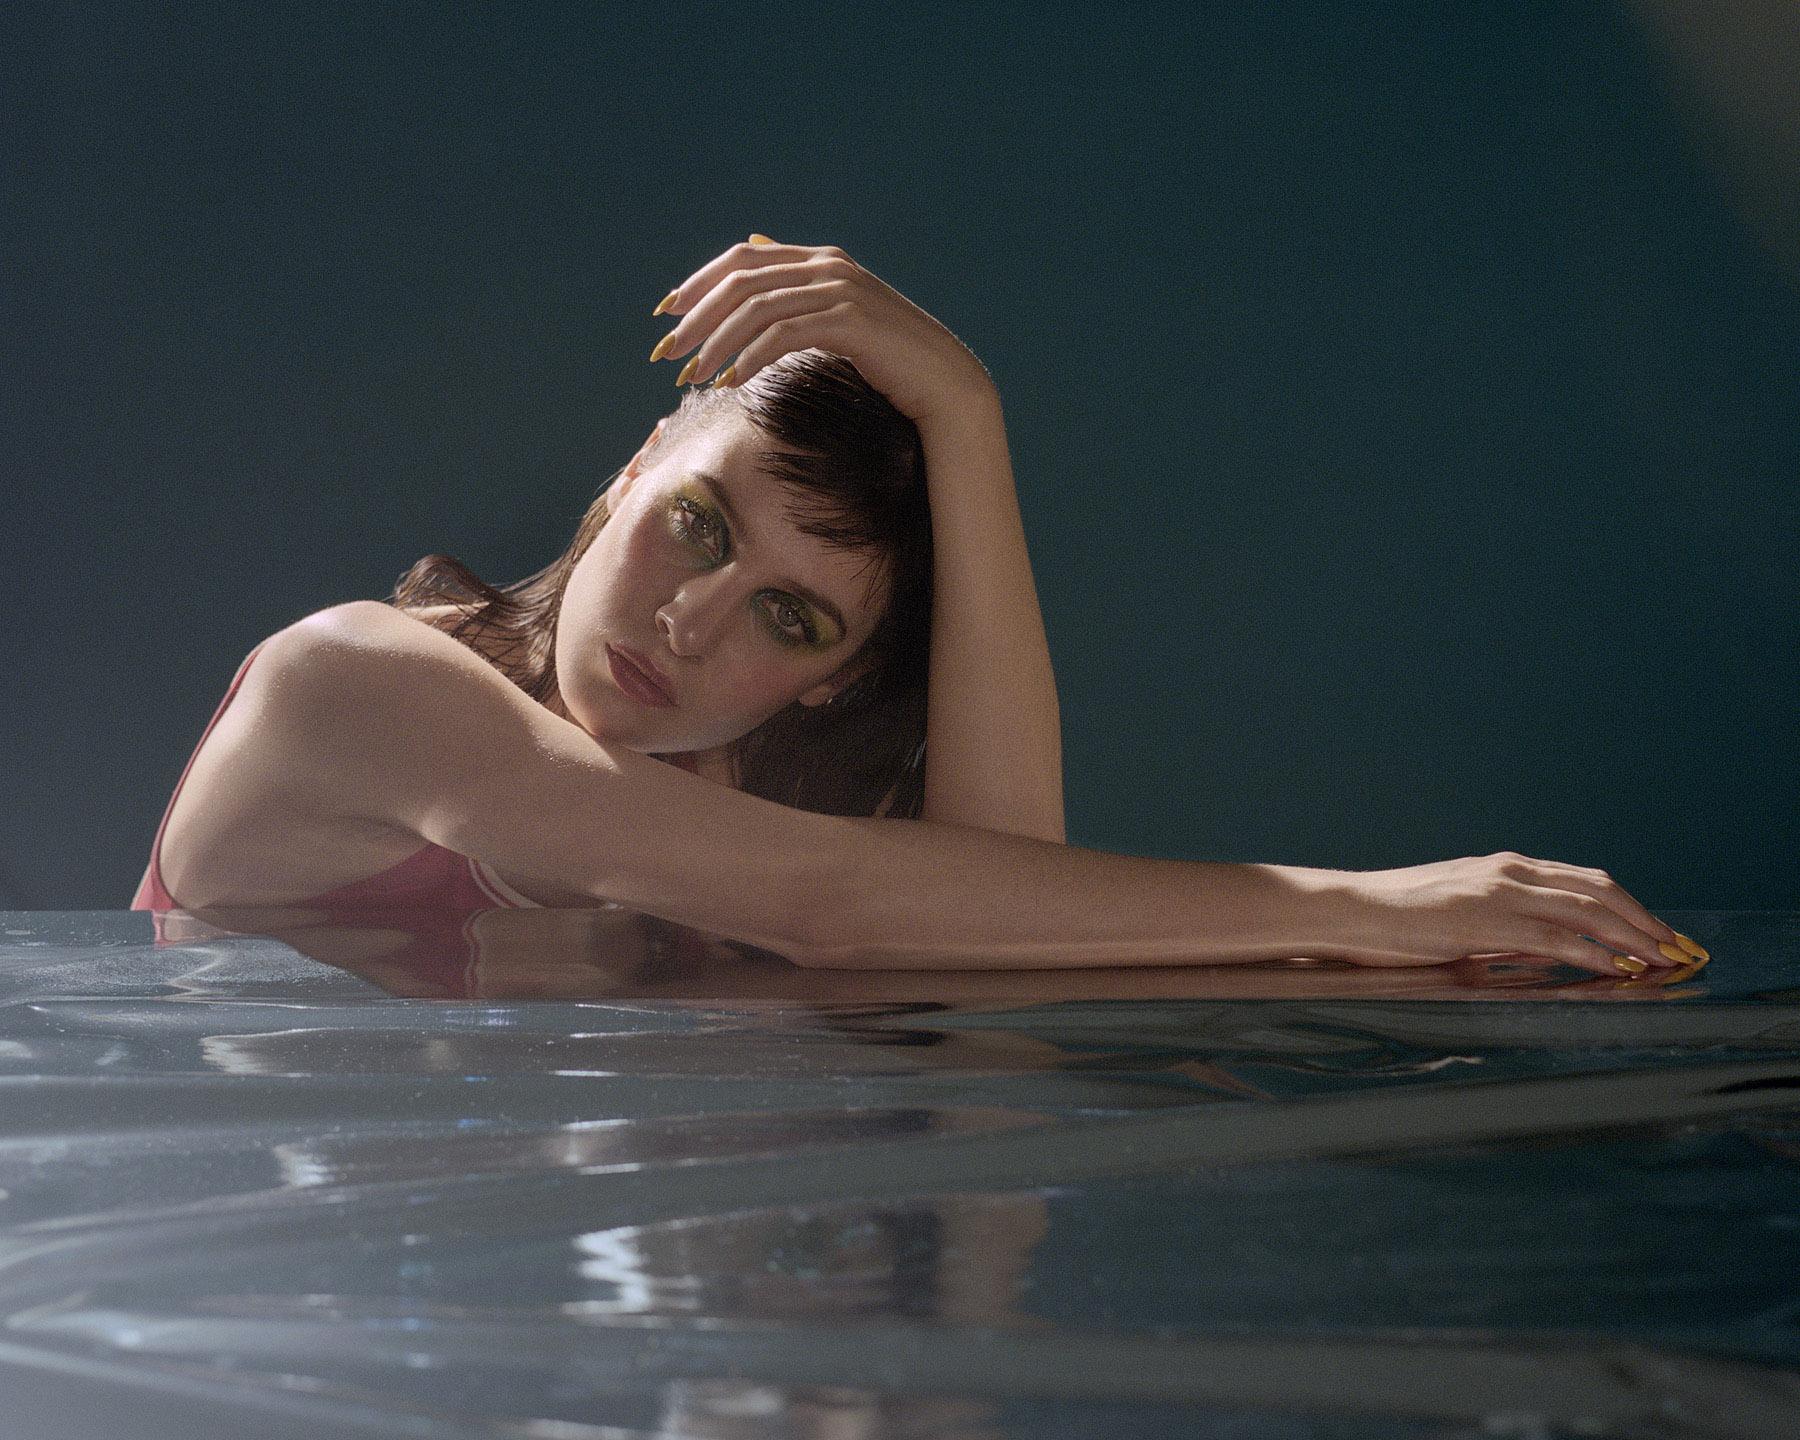 iGNANT-Photography-Calypso-Mahieu-Selection-05